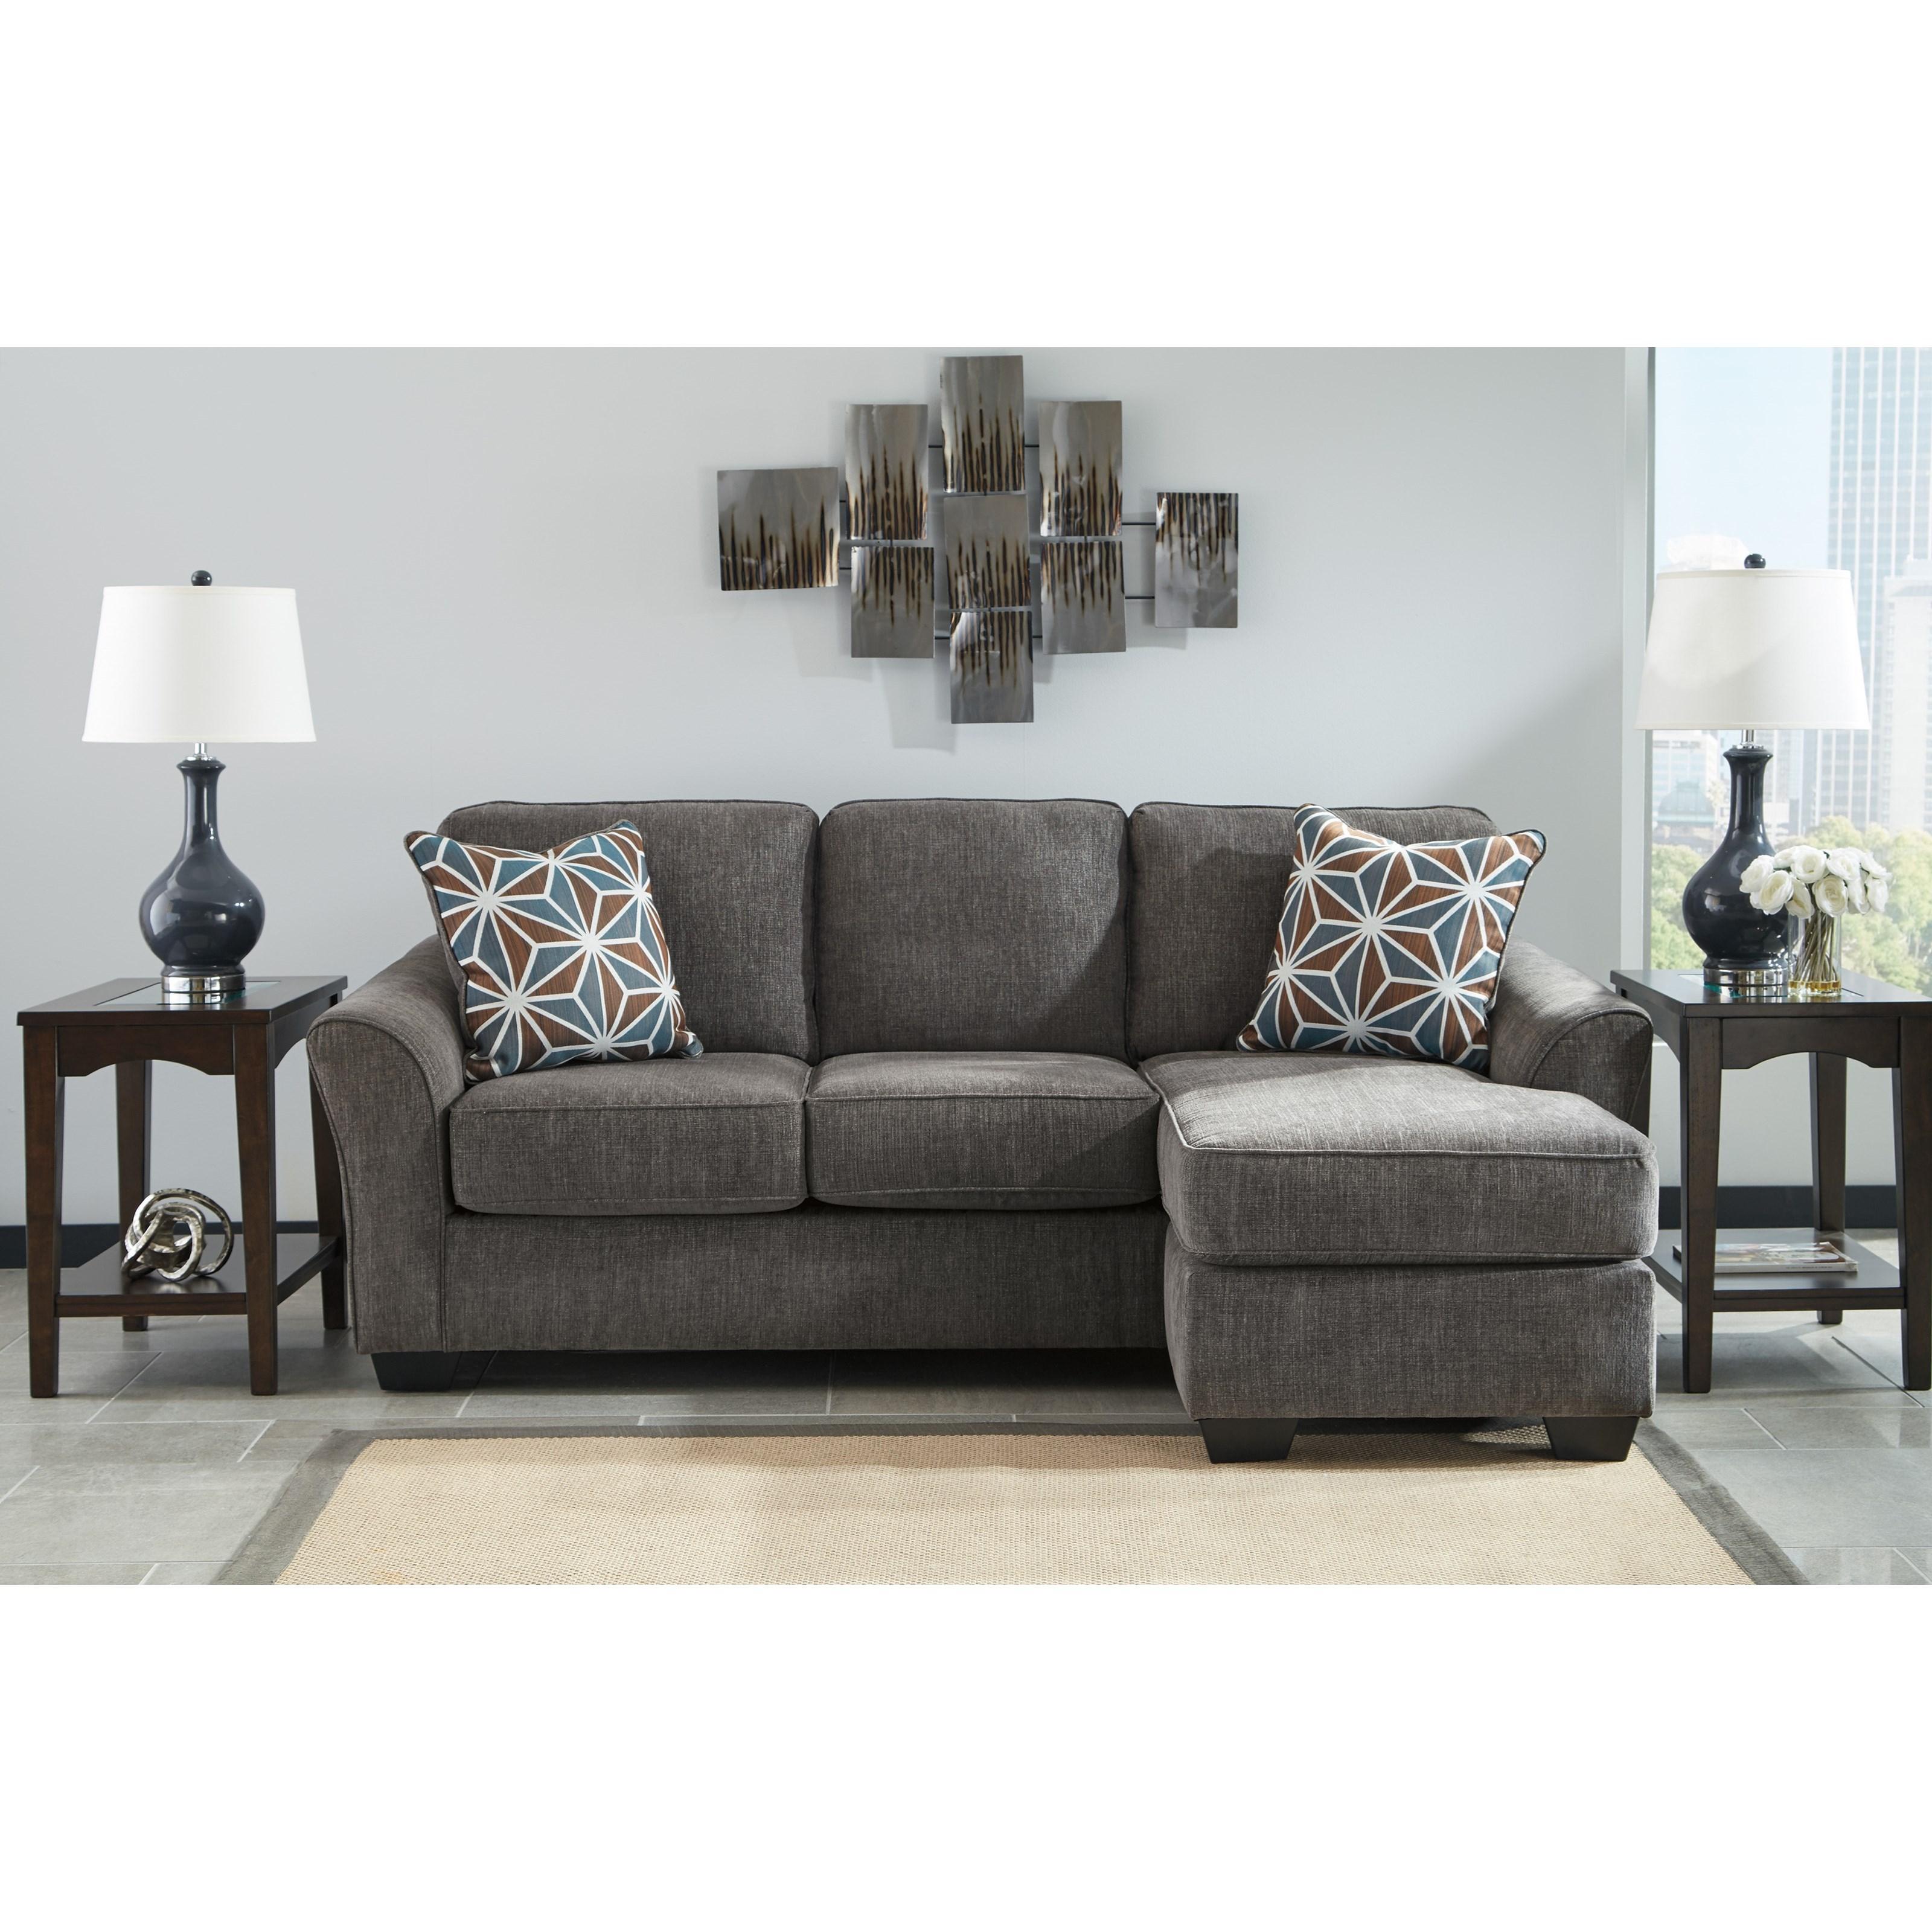 Benchcraft Brise 8410268 Casual Contemporary Queen Sofa